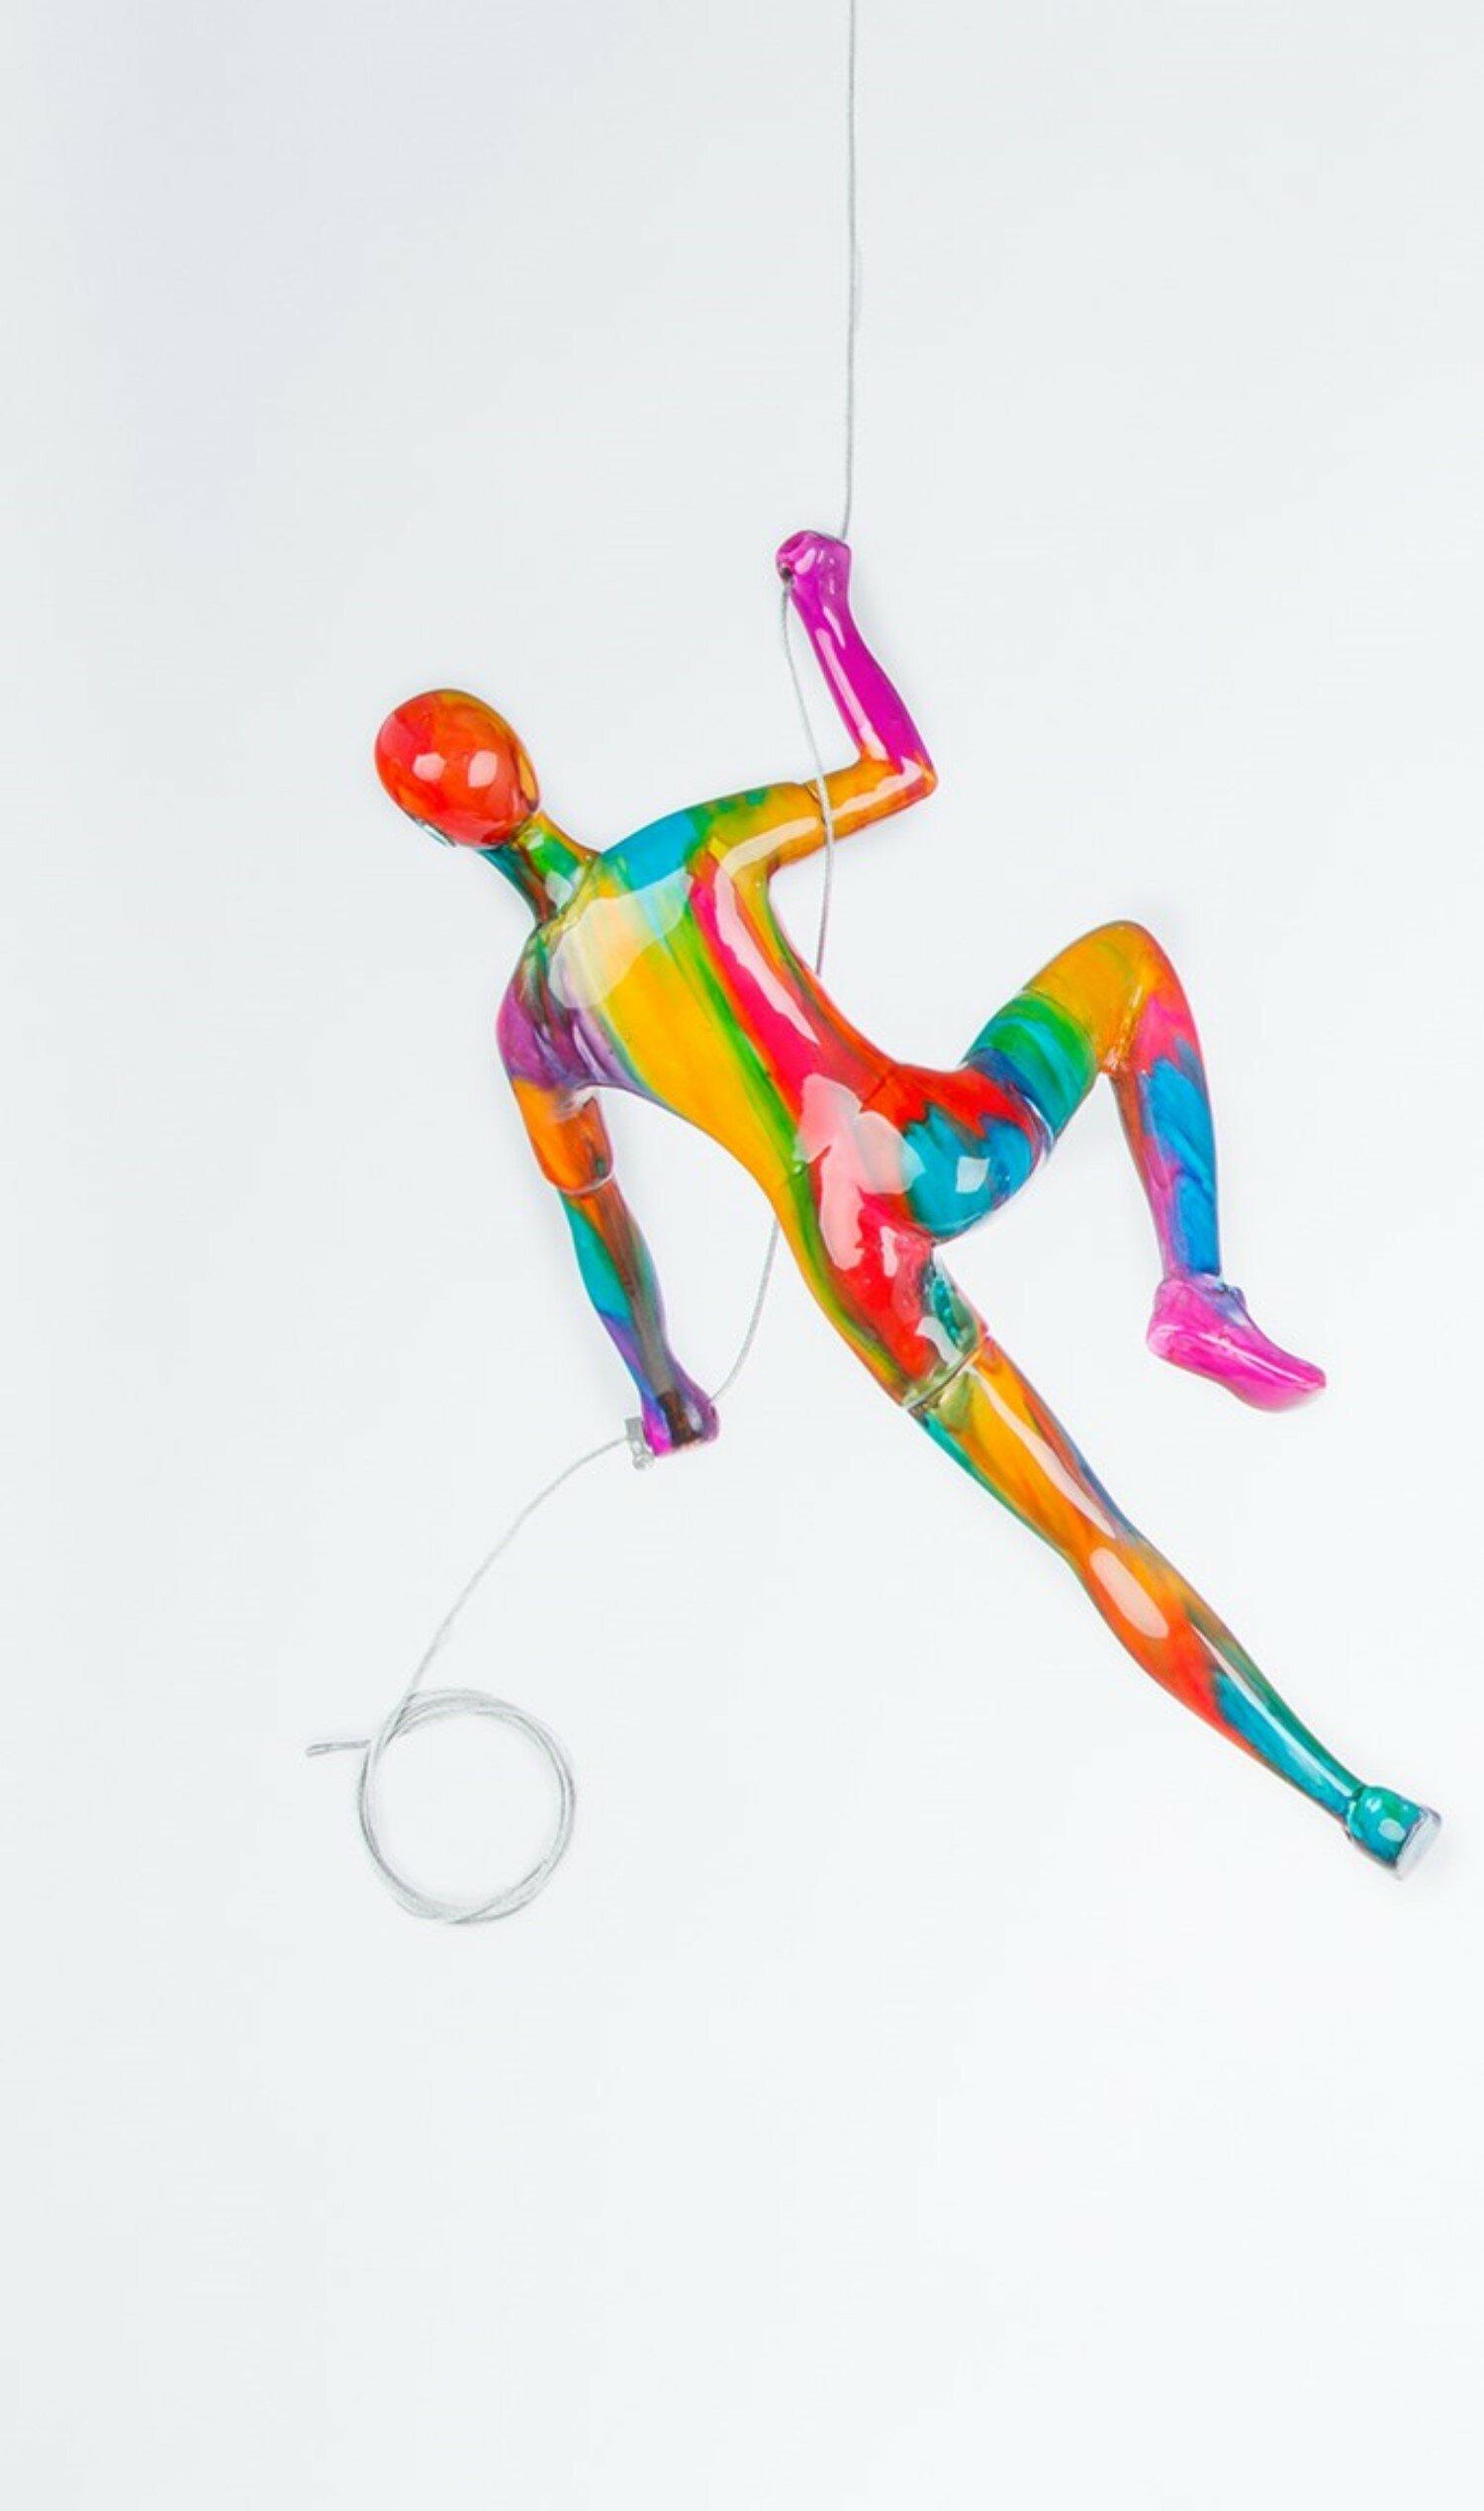 Forum on this topic: Latitude Run 4 Piece Climber Sculpture Wall , latitude-run-4-piece-climber-sculpture-wall/